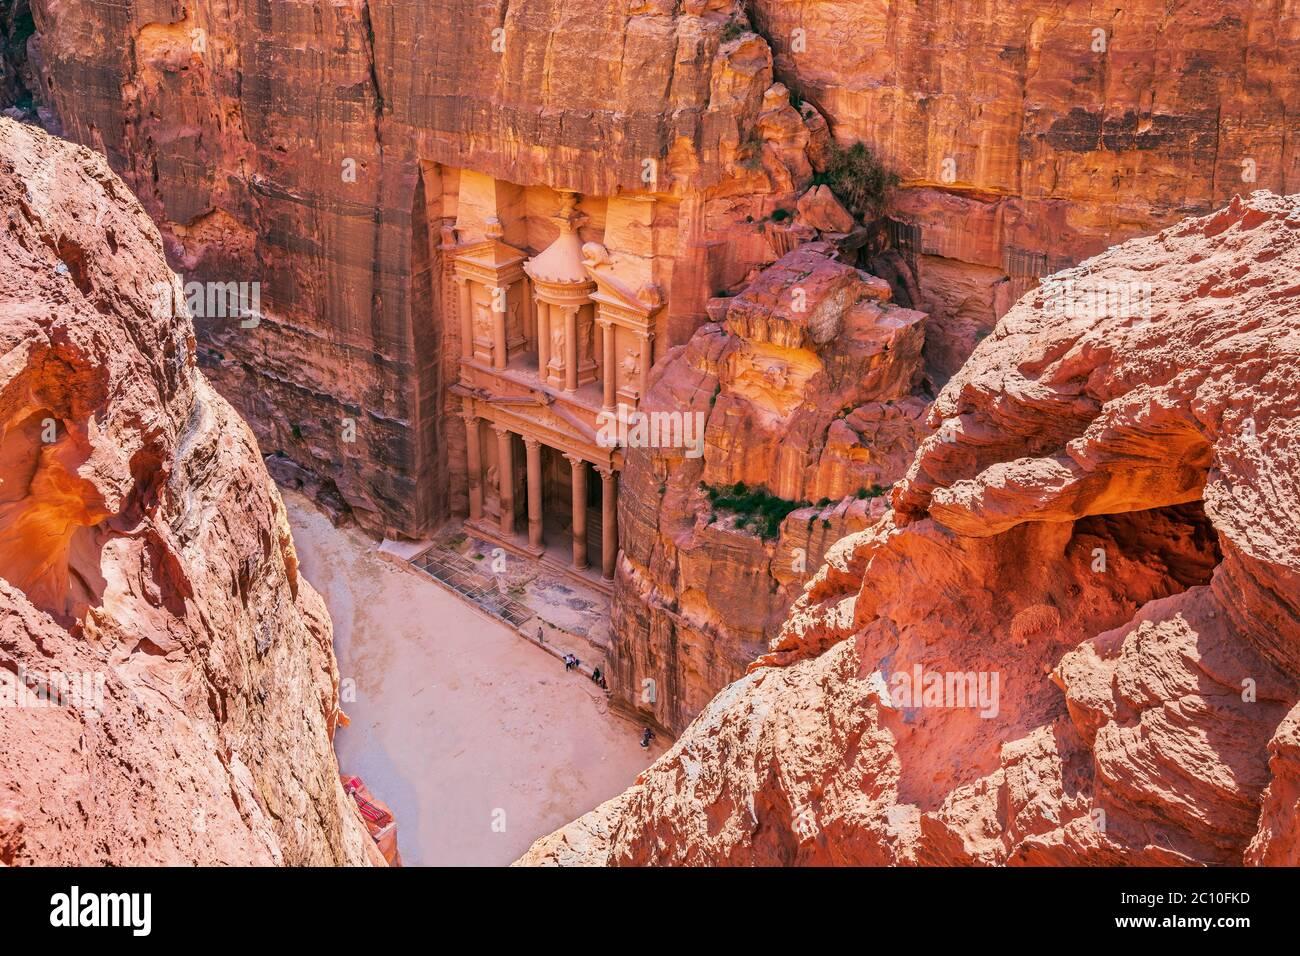 Petra, Jordan. Al-Khazneh (The Treasury) in Petra seen from above. Stock Photo